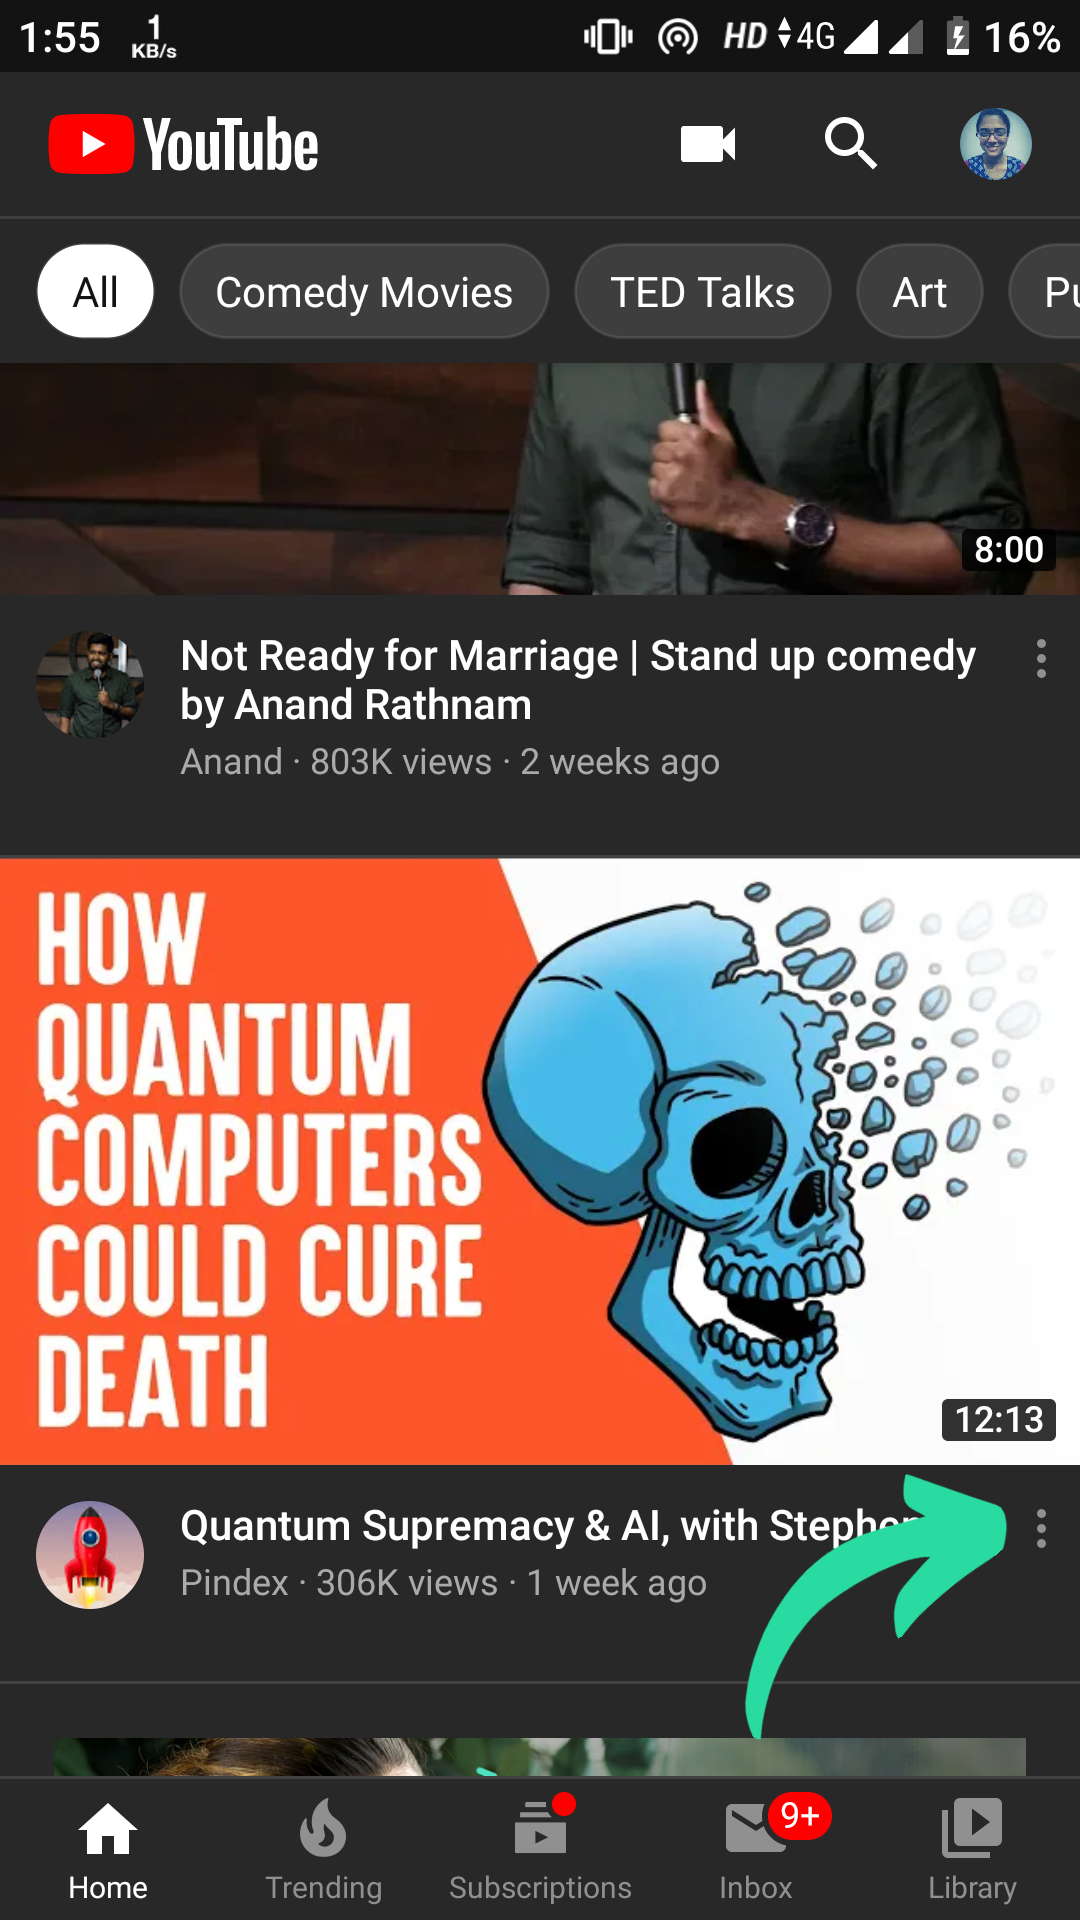 youtube: menu button